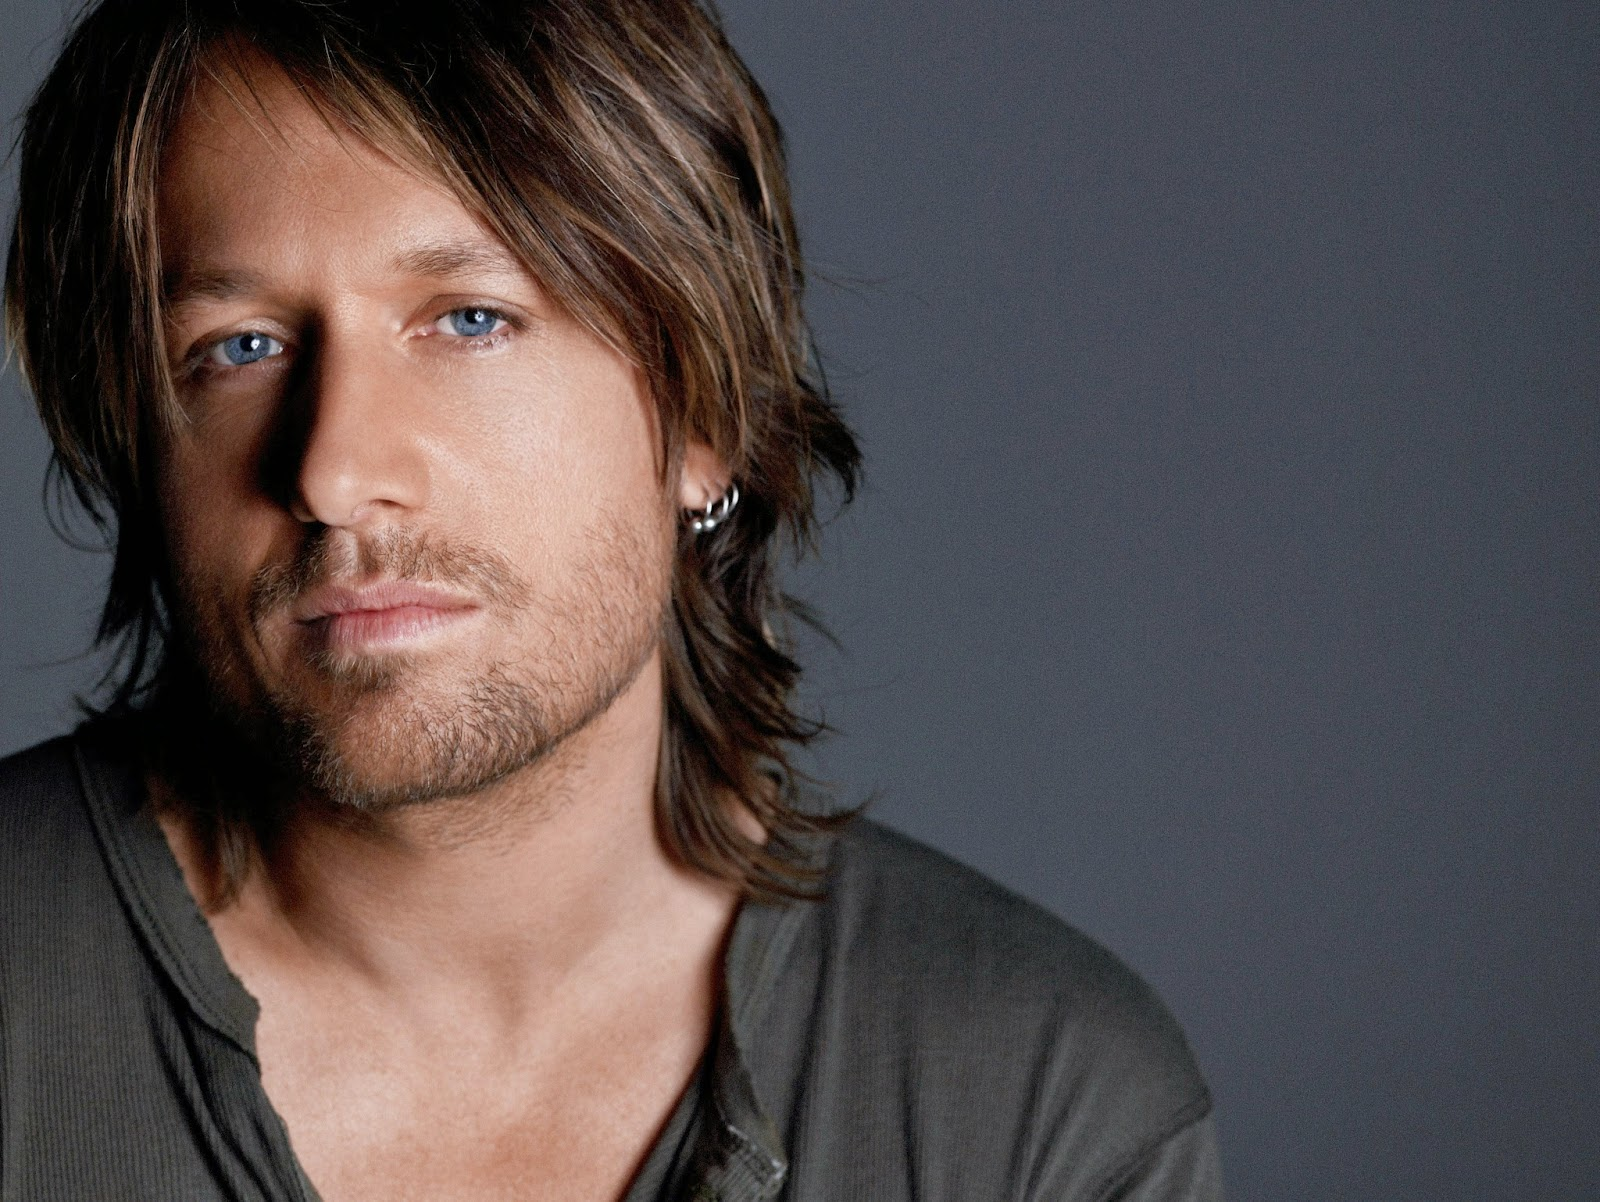 Country Music Stars Radio Keith Lionel Urban Born 26